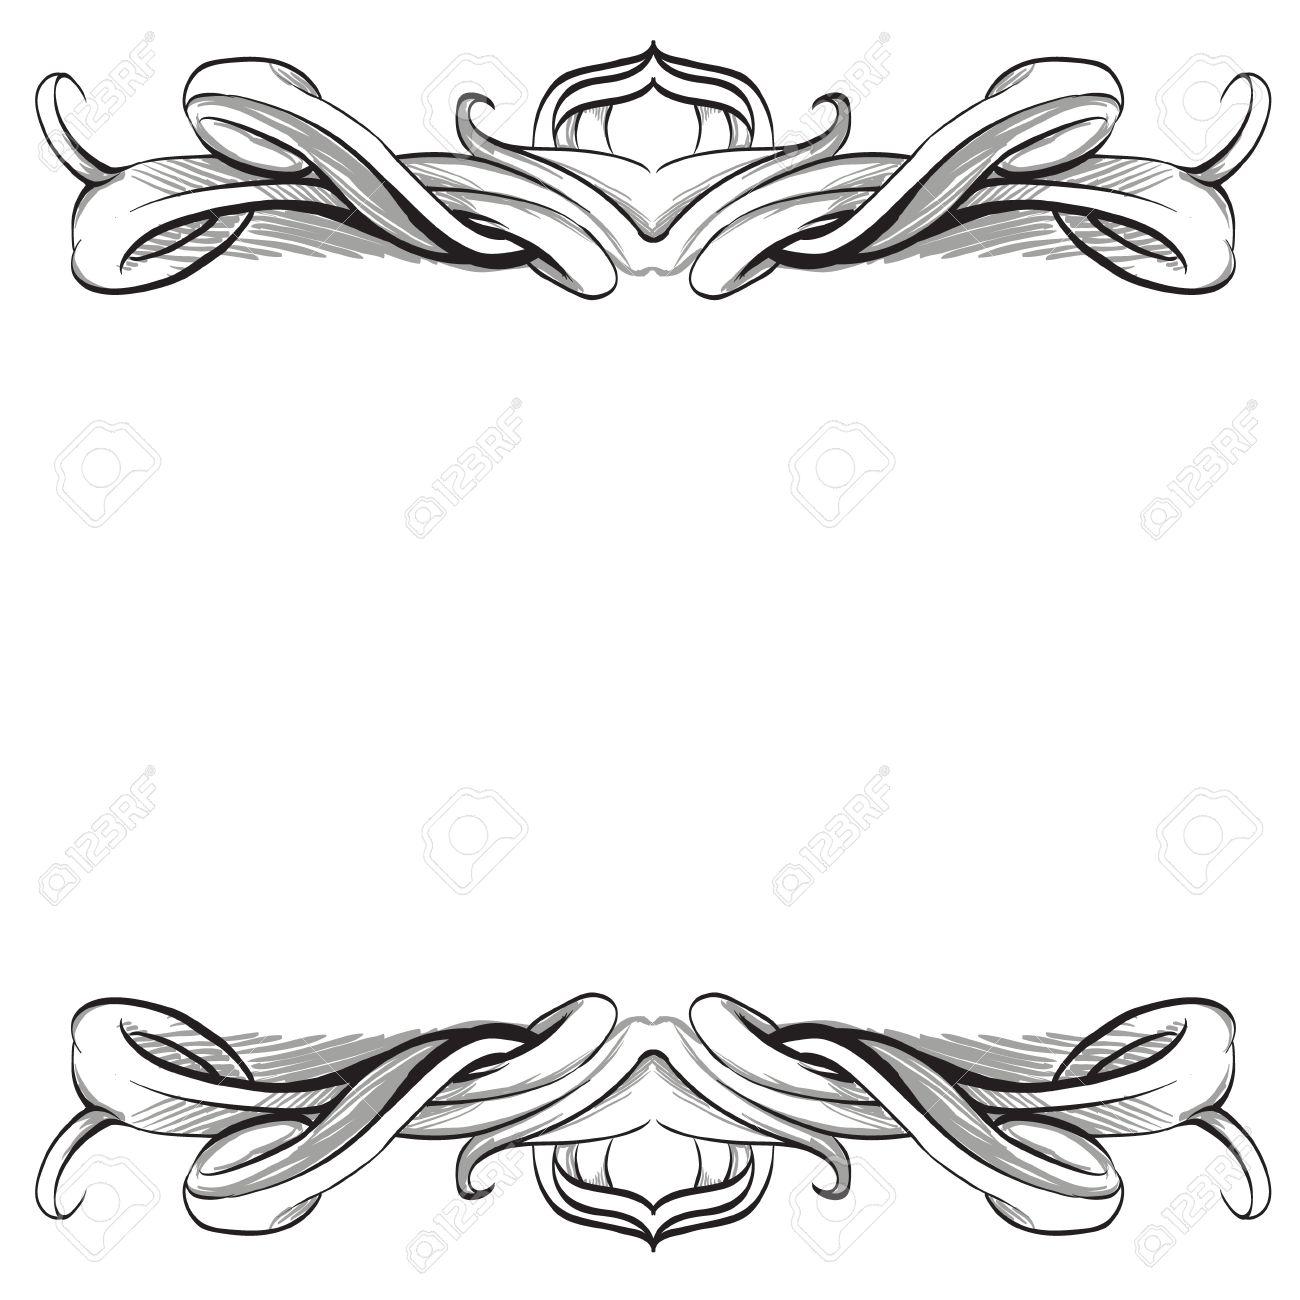 Blackbordercalligraphycertificateclassicalcoverdecoration blackbordercalligraphycertificateclassicalcoverdecorationdecorativedesigndividereleganceelegantelementexquisitefiligreefloralflourish stopboris Choice Image